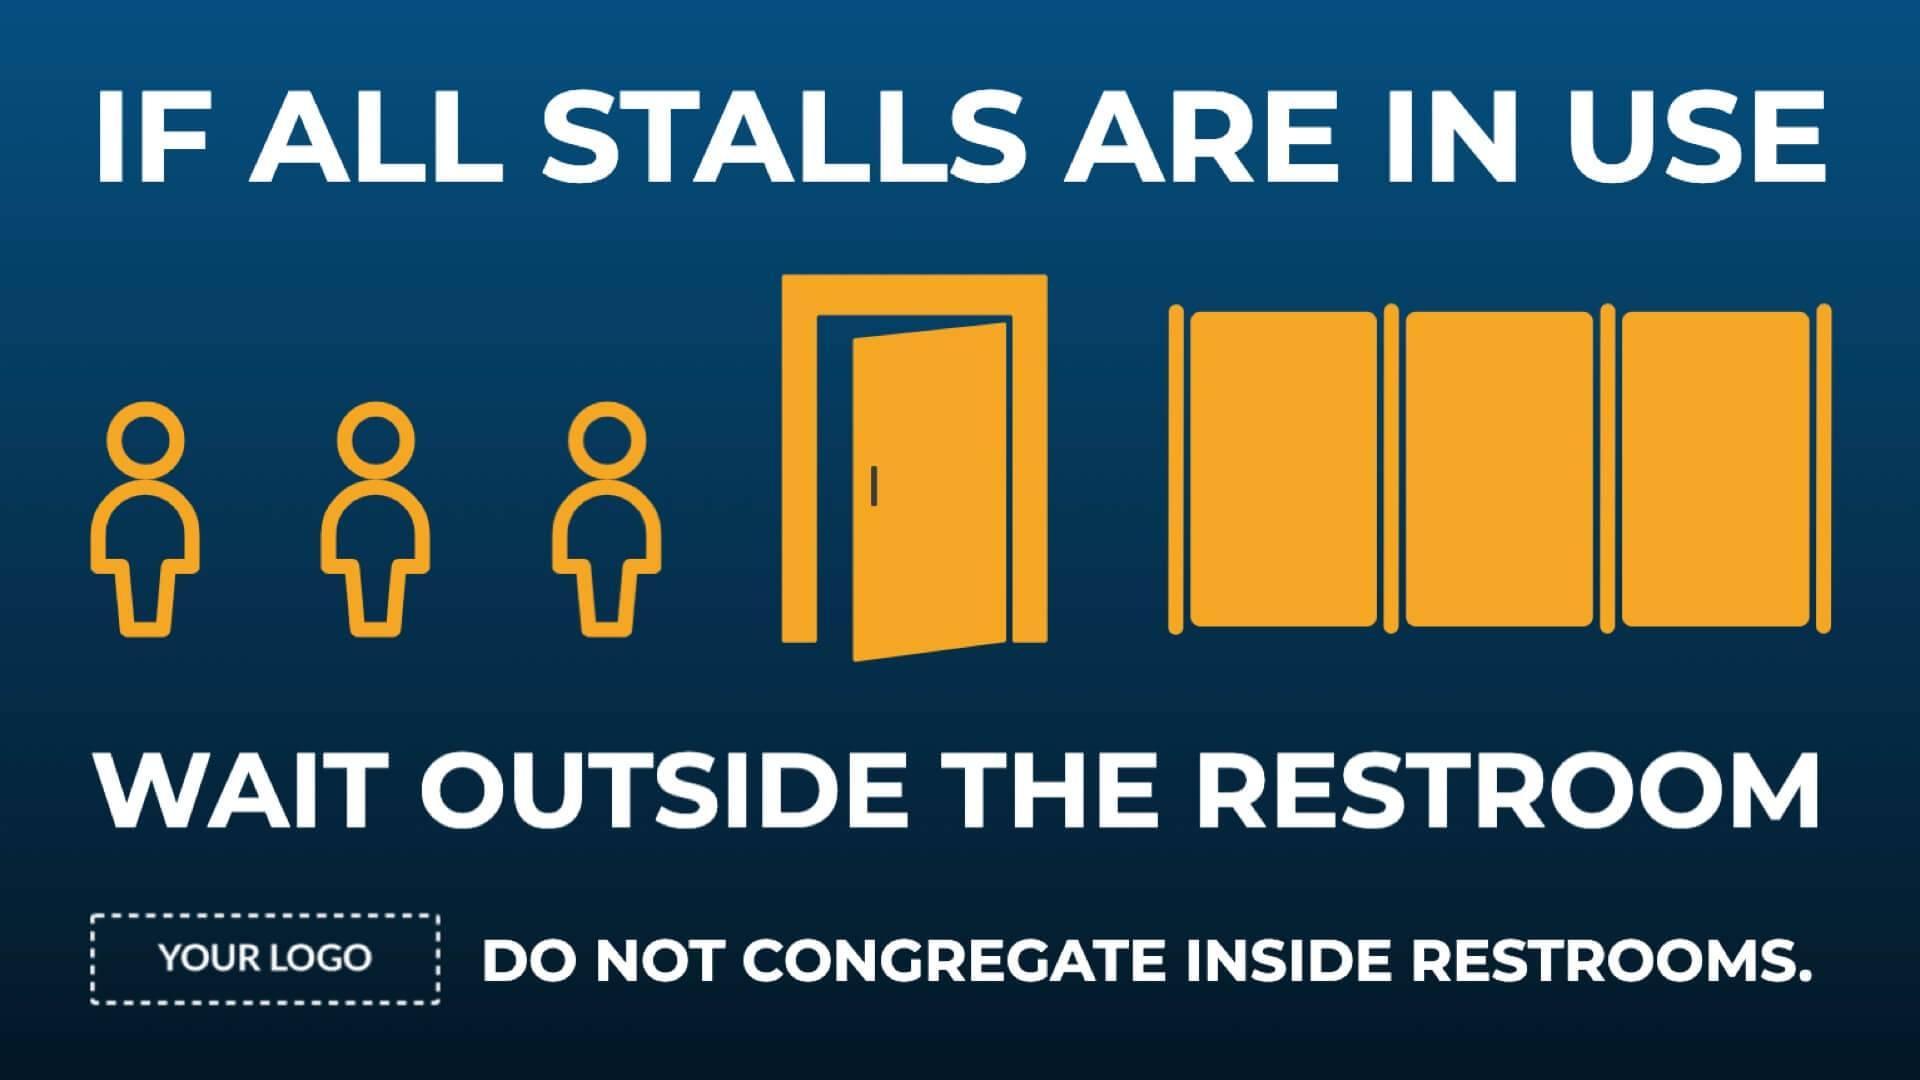 Campaign Restroom Lineup Digital Signage Template